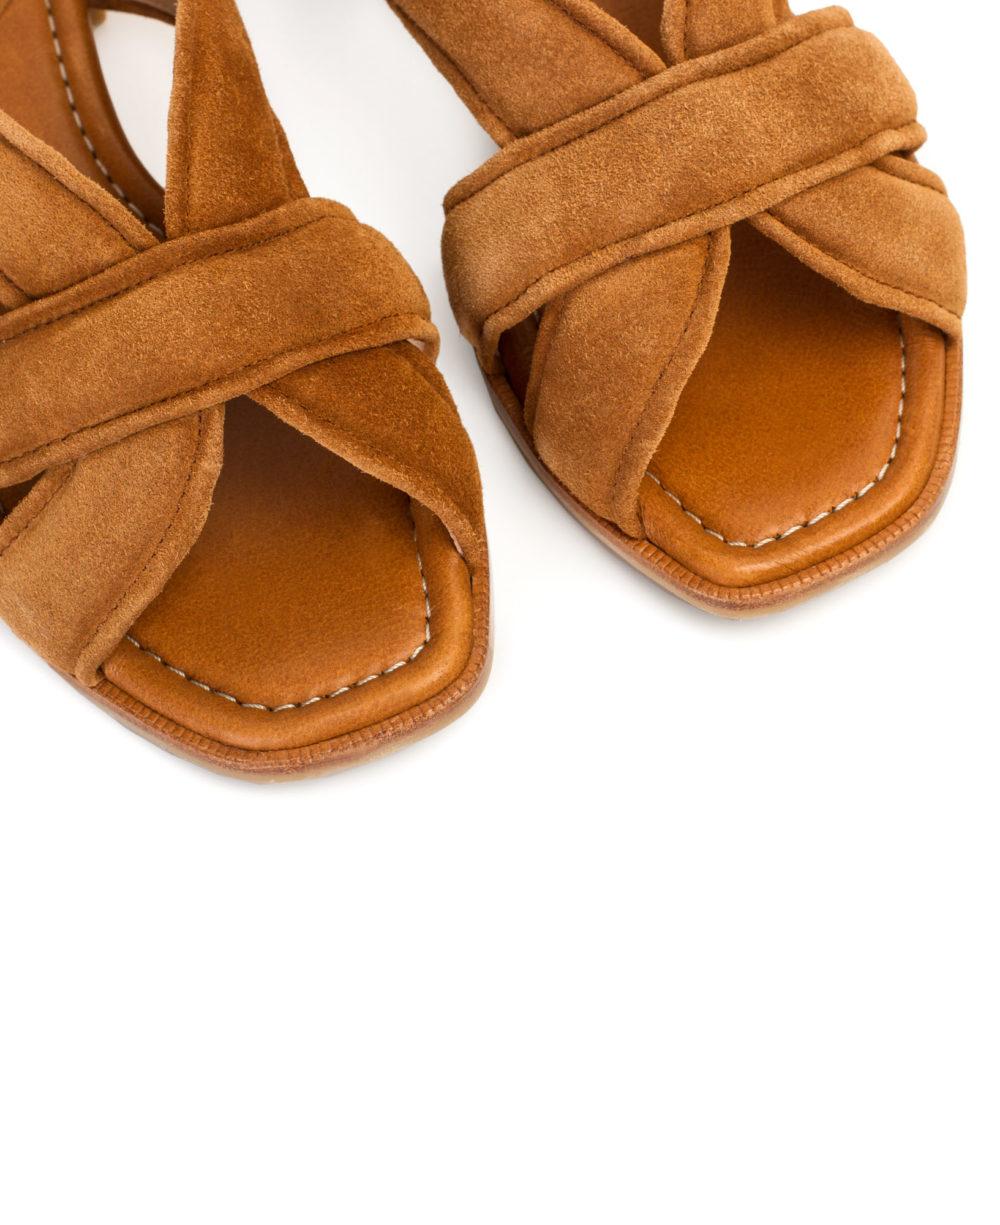 Sandalias de Piel Paco Gil - P-3917 Cuoio Velour Detalle